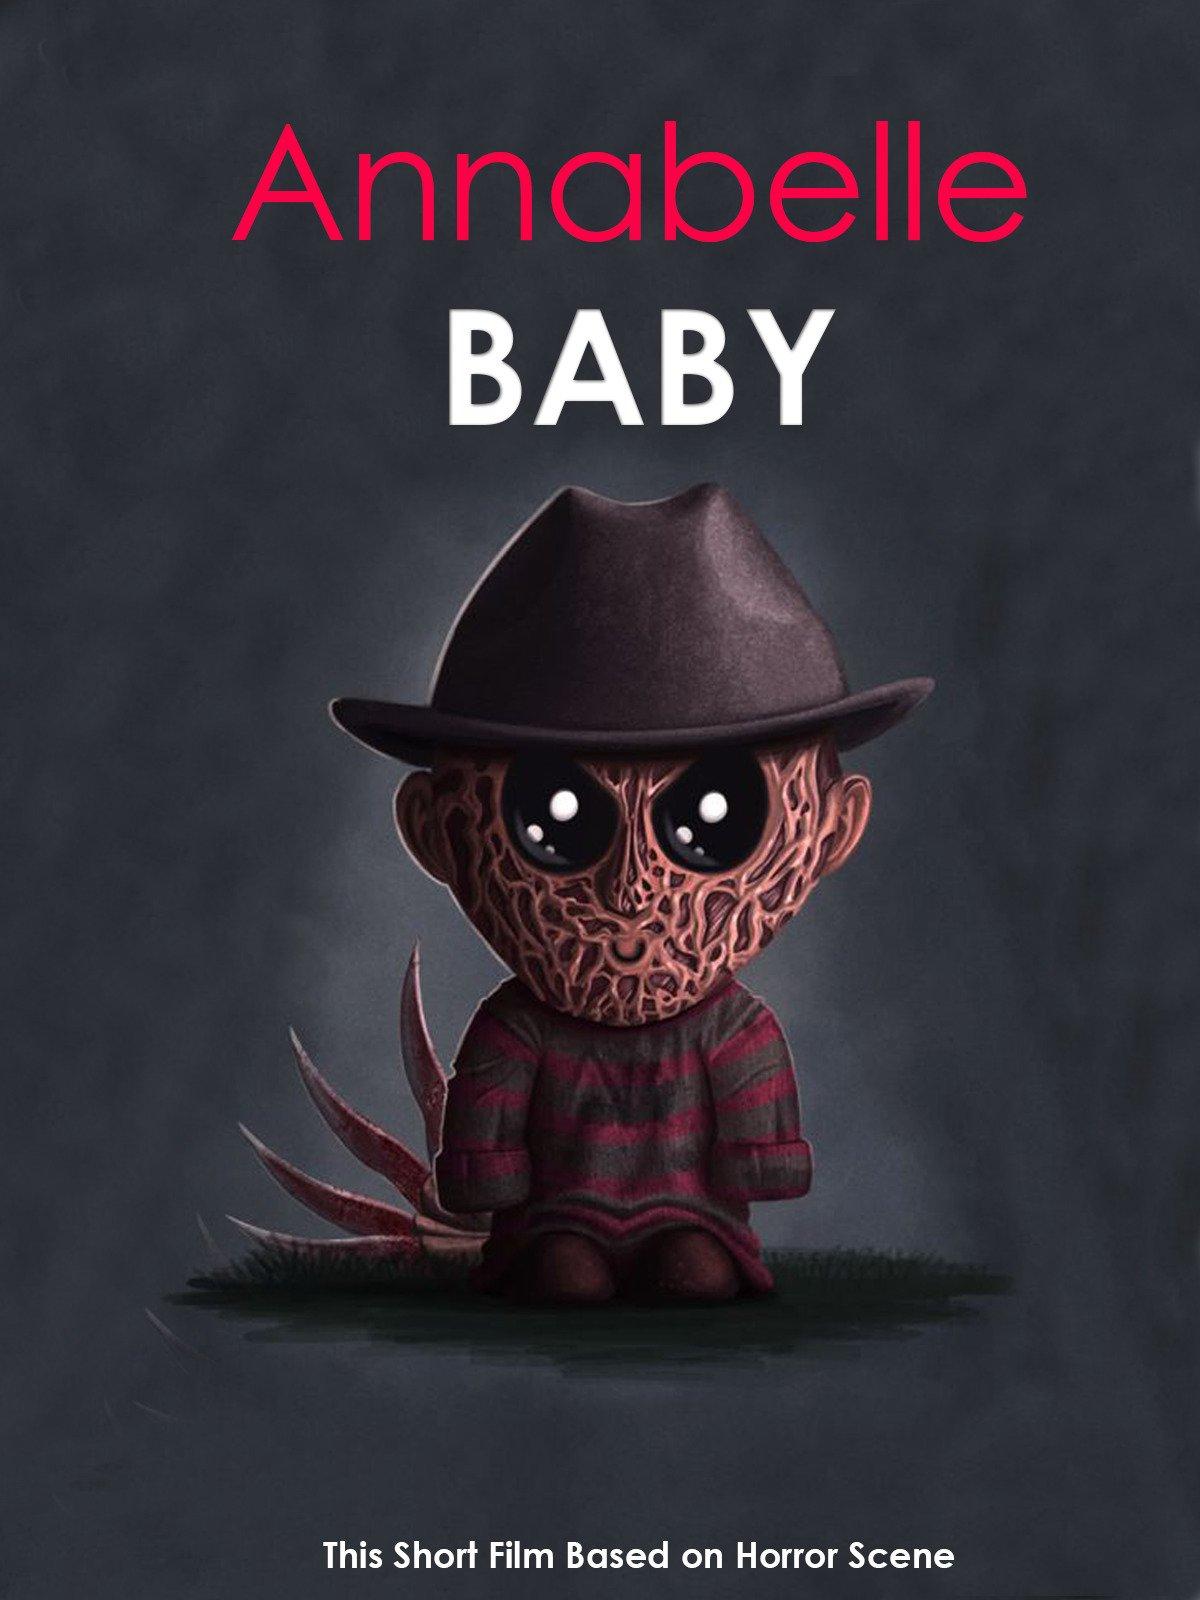 Annabelle: Baby